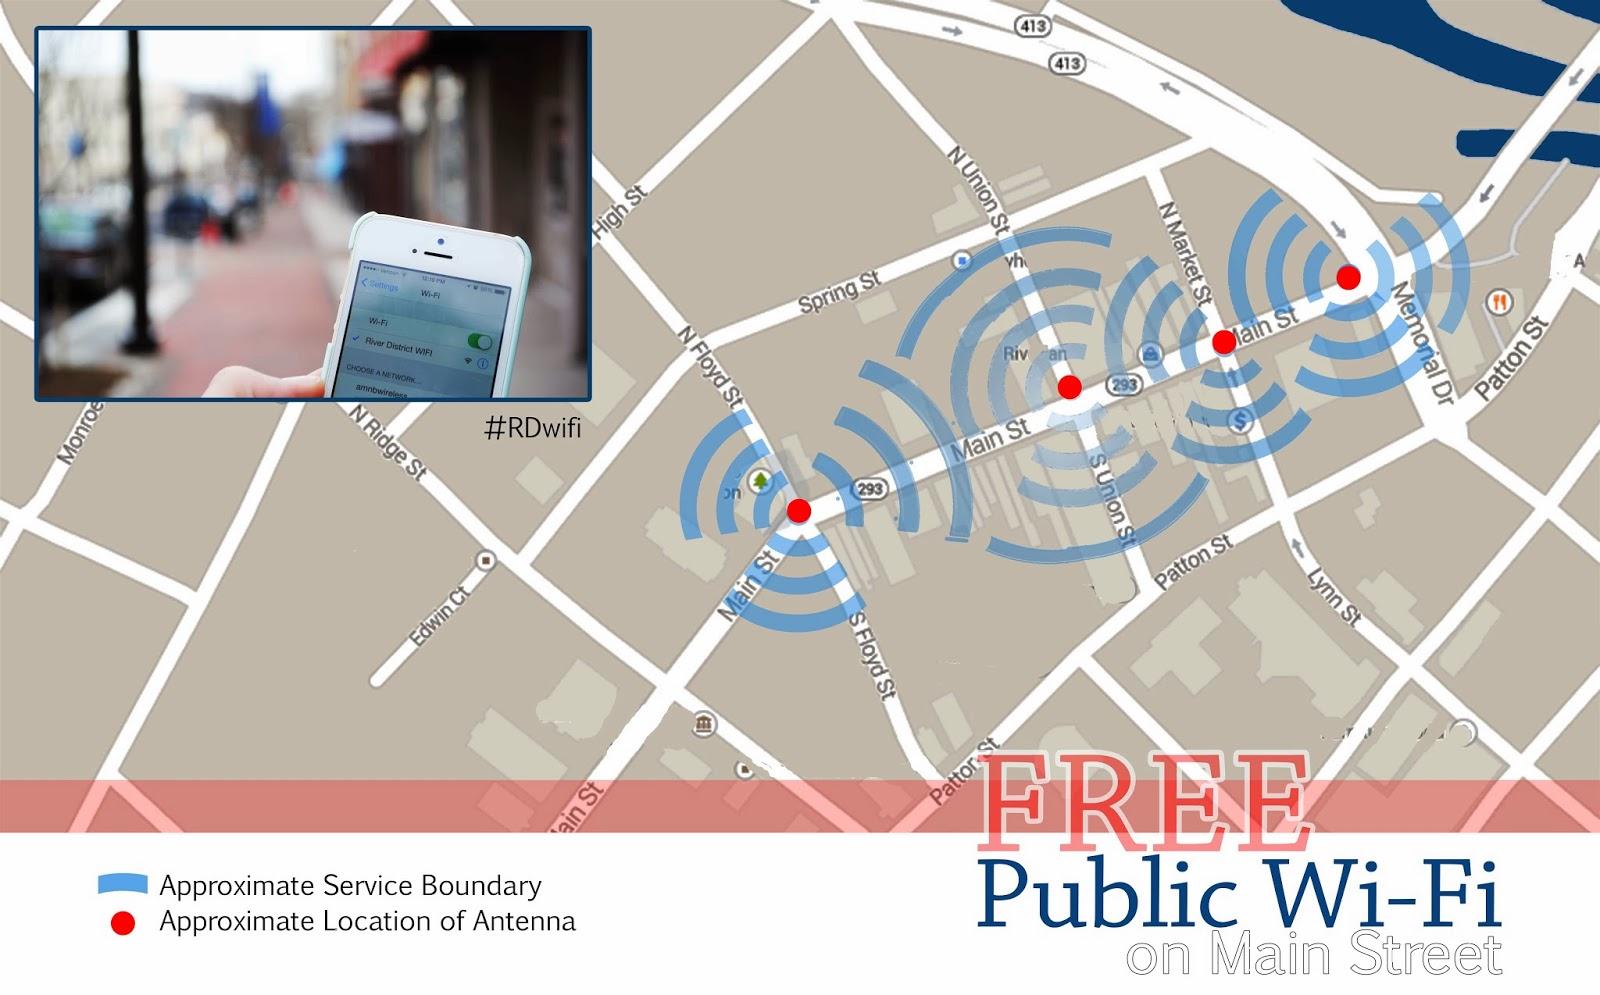 Danville VA, Virginia, River District, Downtown Danville, Free Wi-fi, #RDWifi